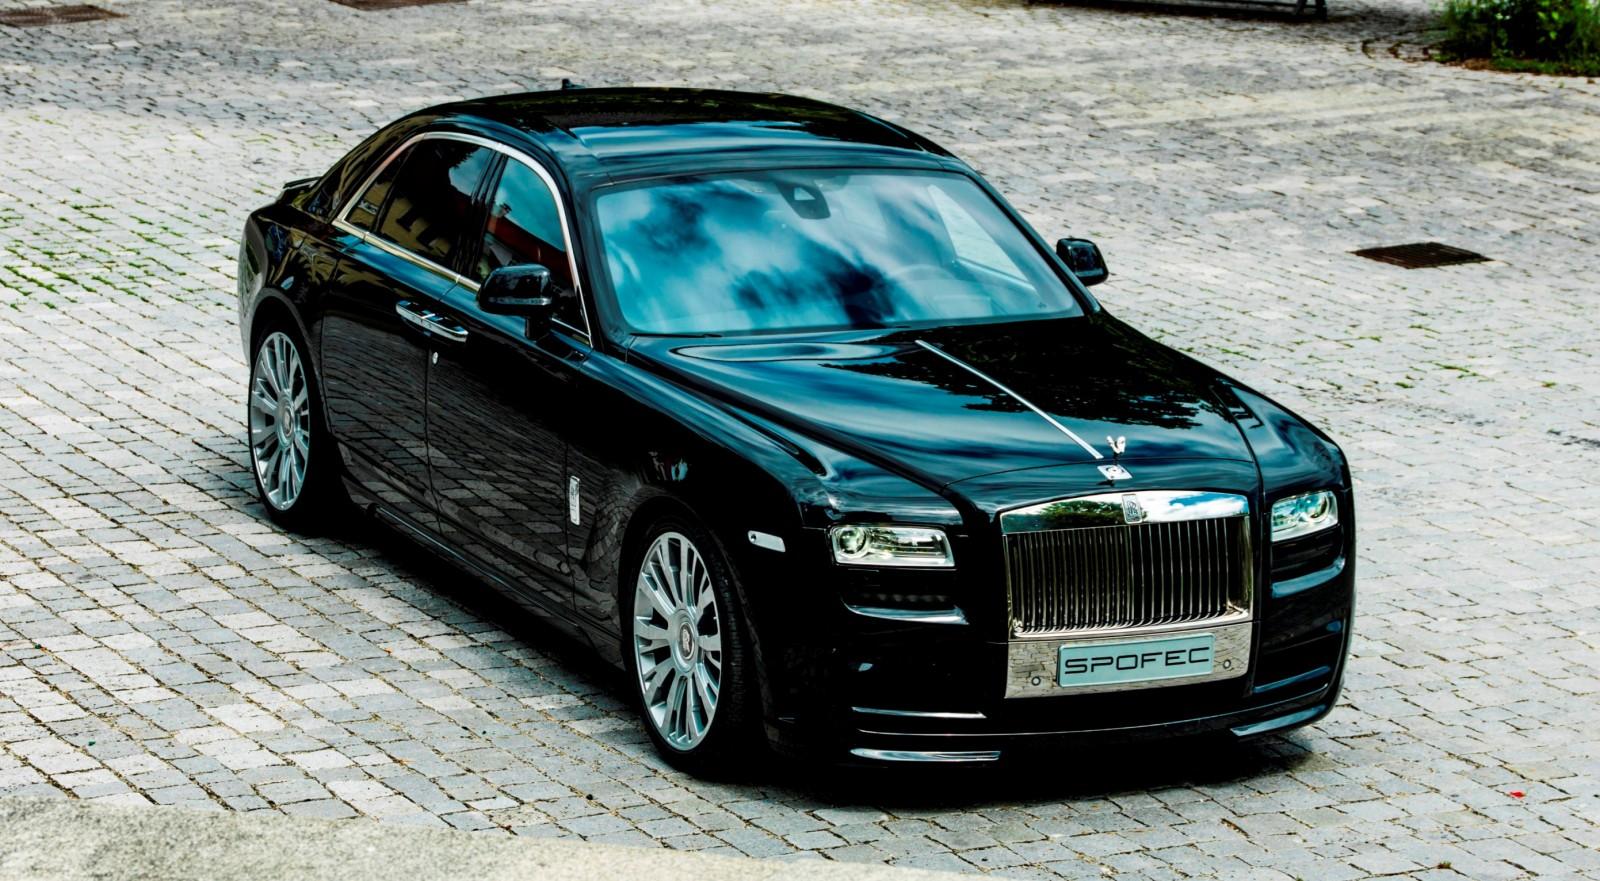 Novitec SPOFEC Rolls-Royce Ghost 19